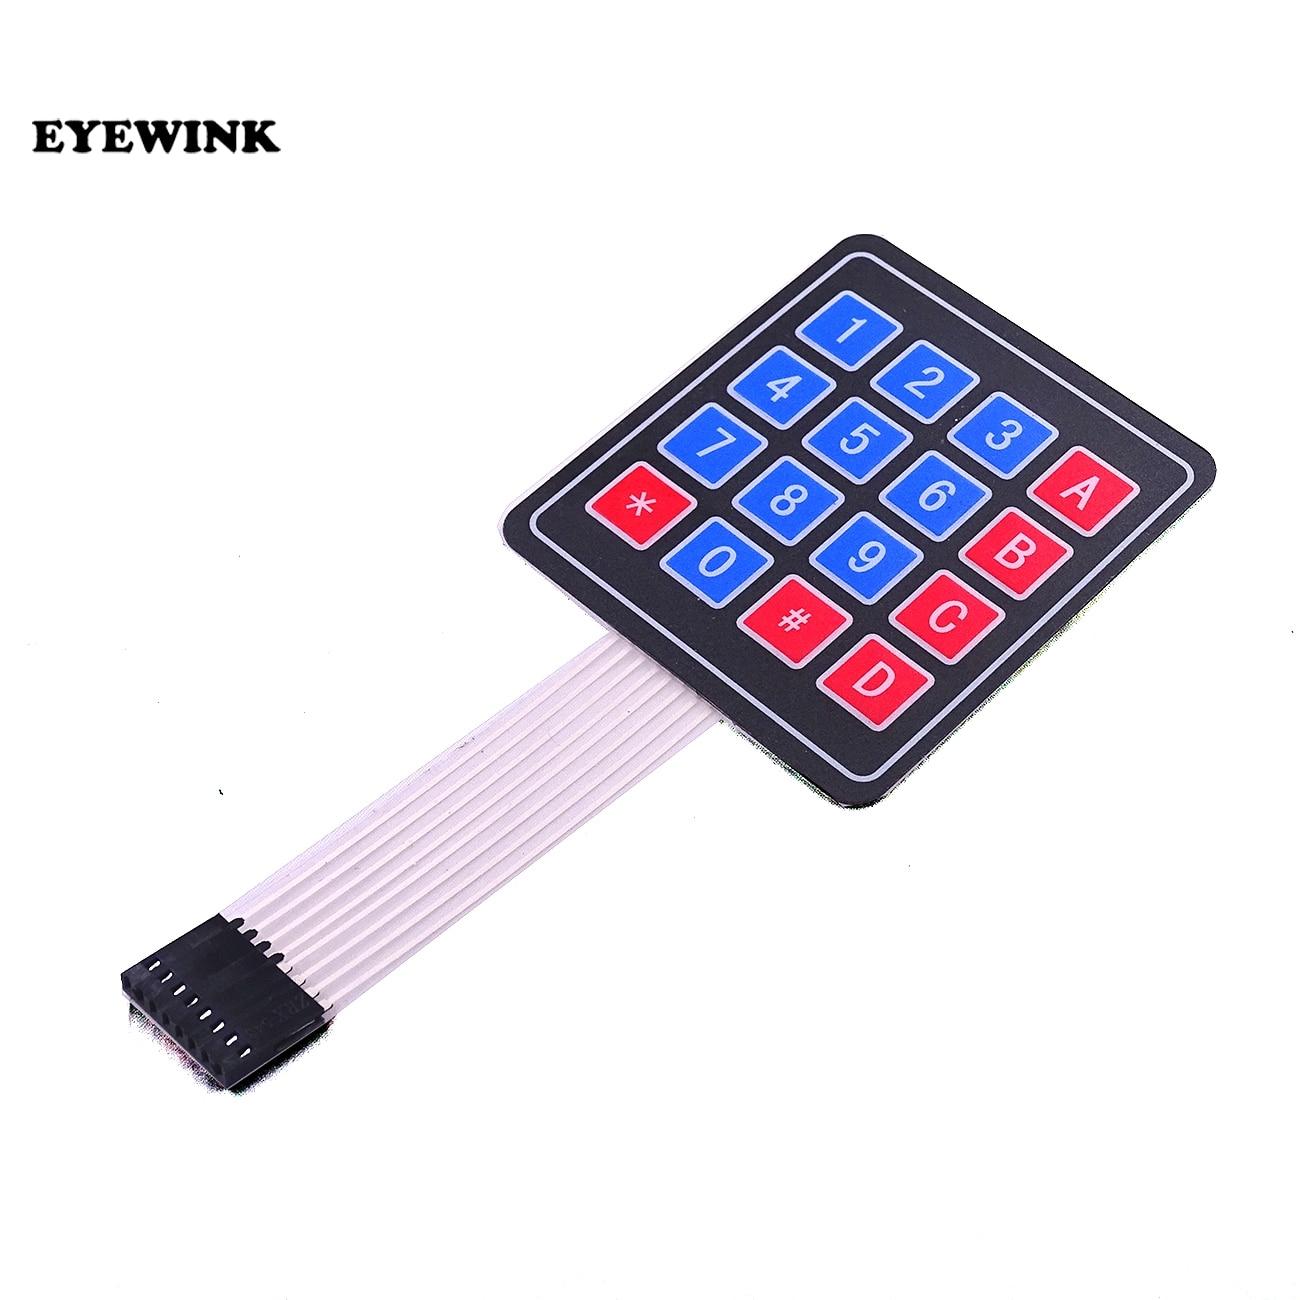 EYEWINK 100PCS New 4 4 Matrix Array Matrix Keyboard 16 Key Membrane Switch Keypad